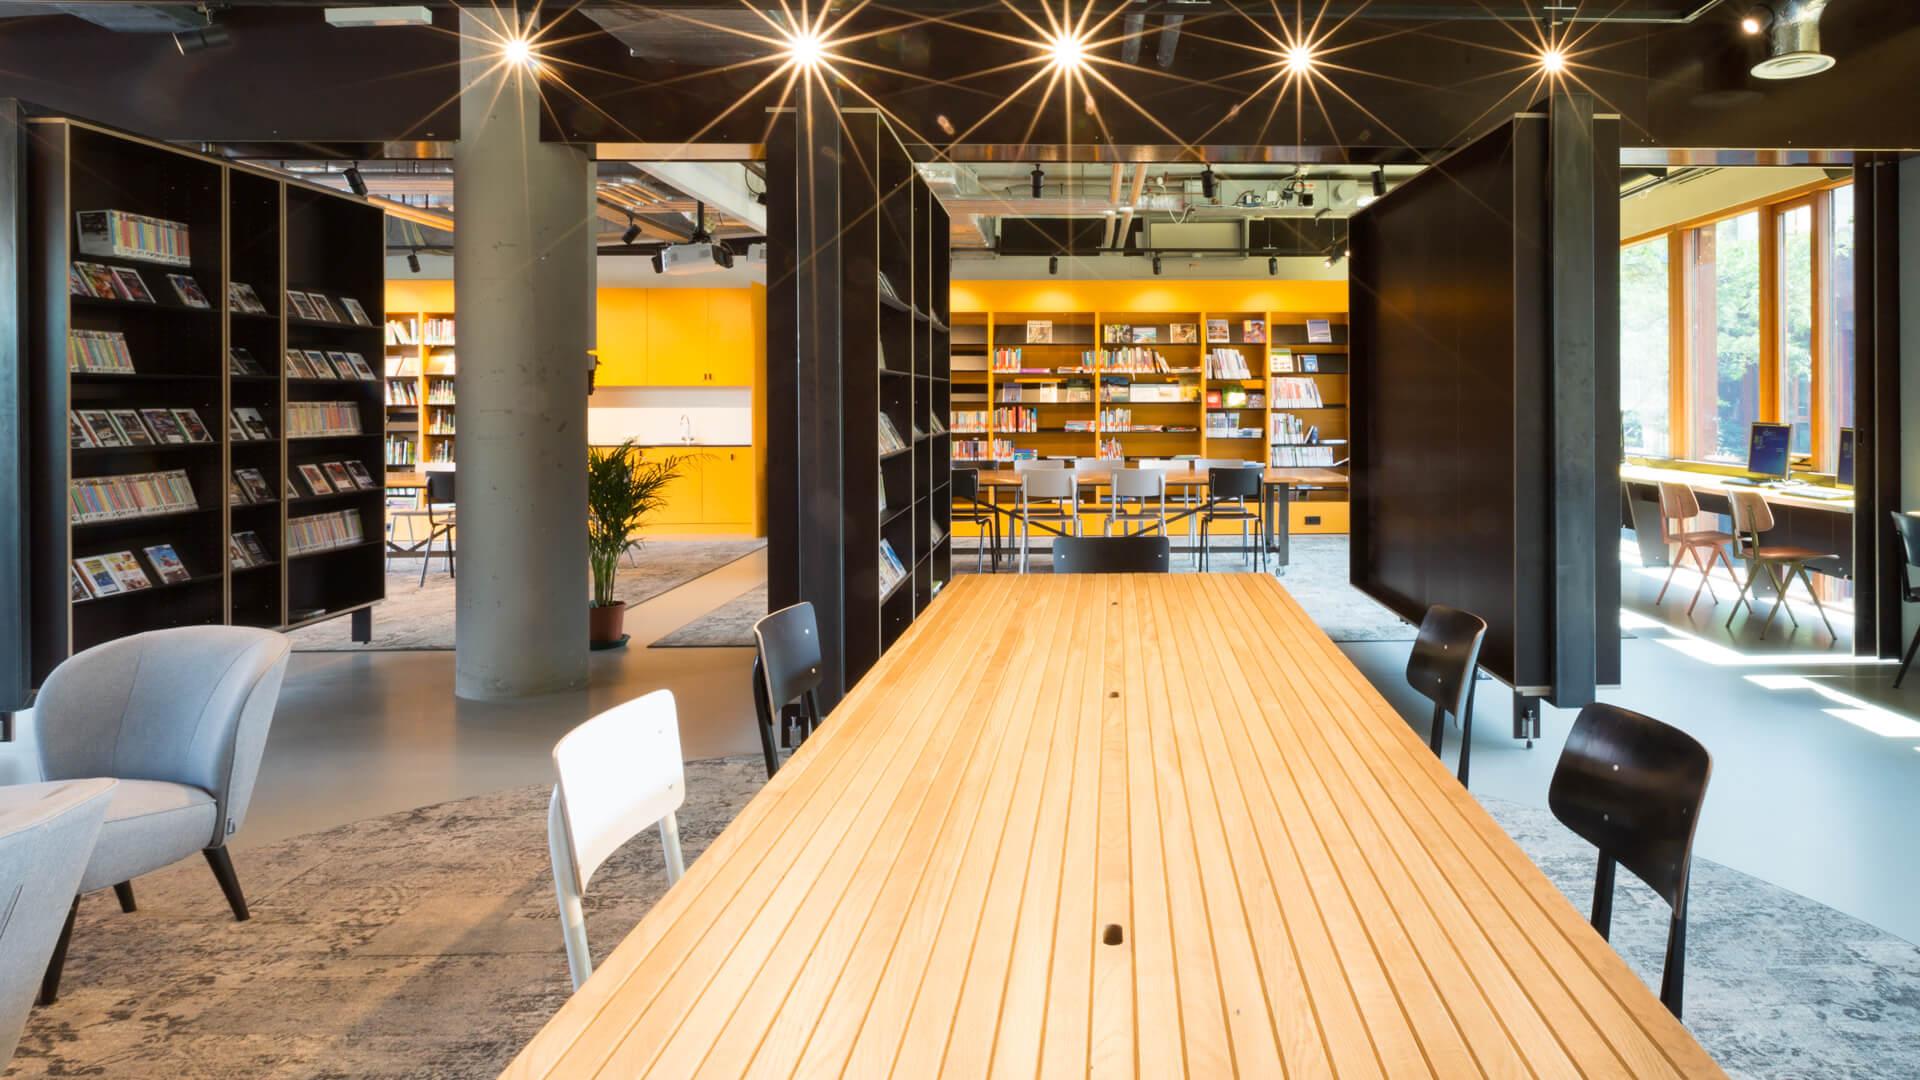 Aatvos-OBA-Bijlmerplein-bibliotheek-design20